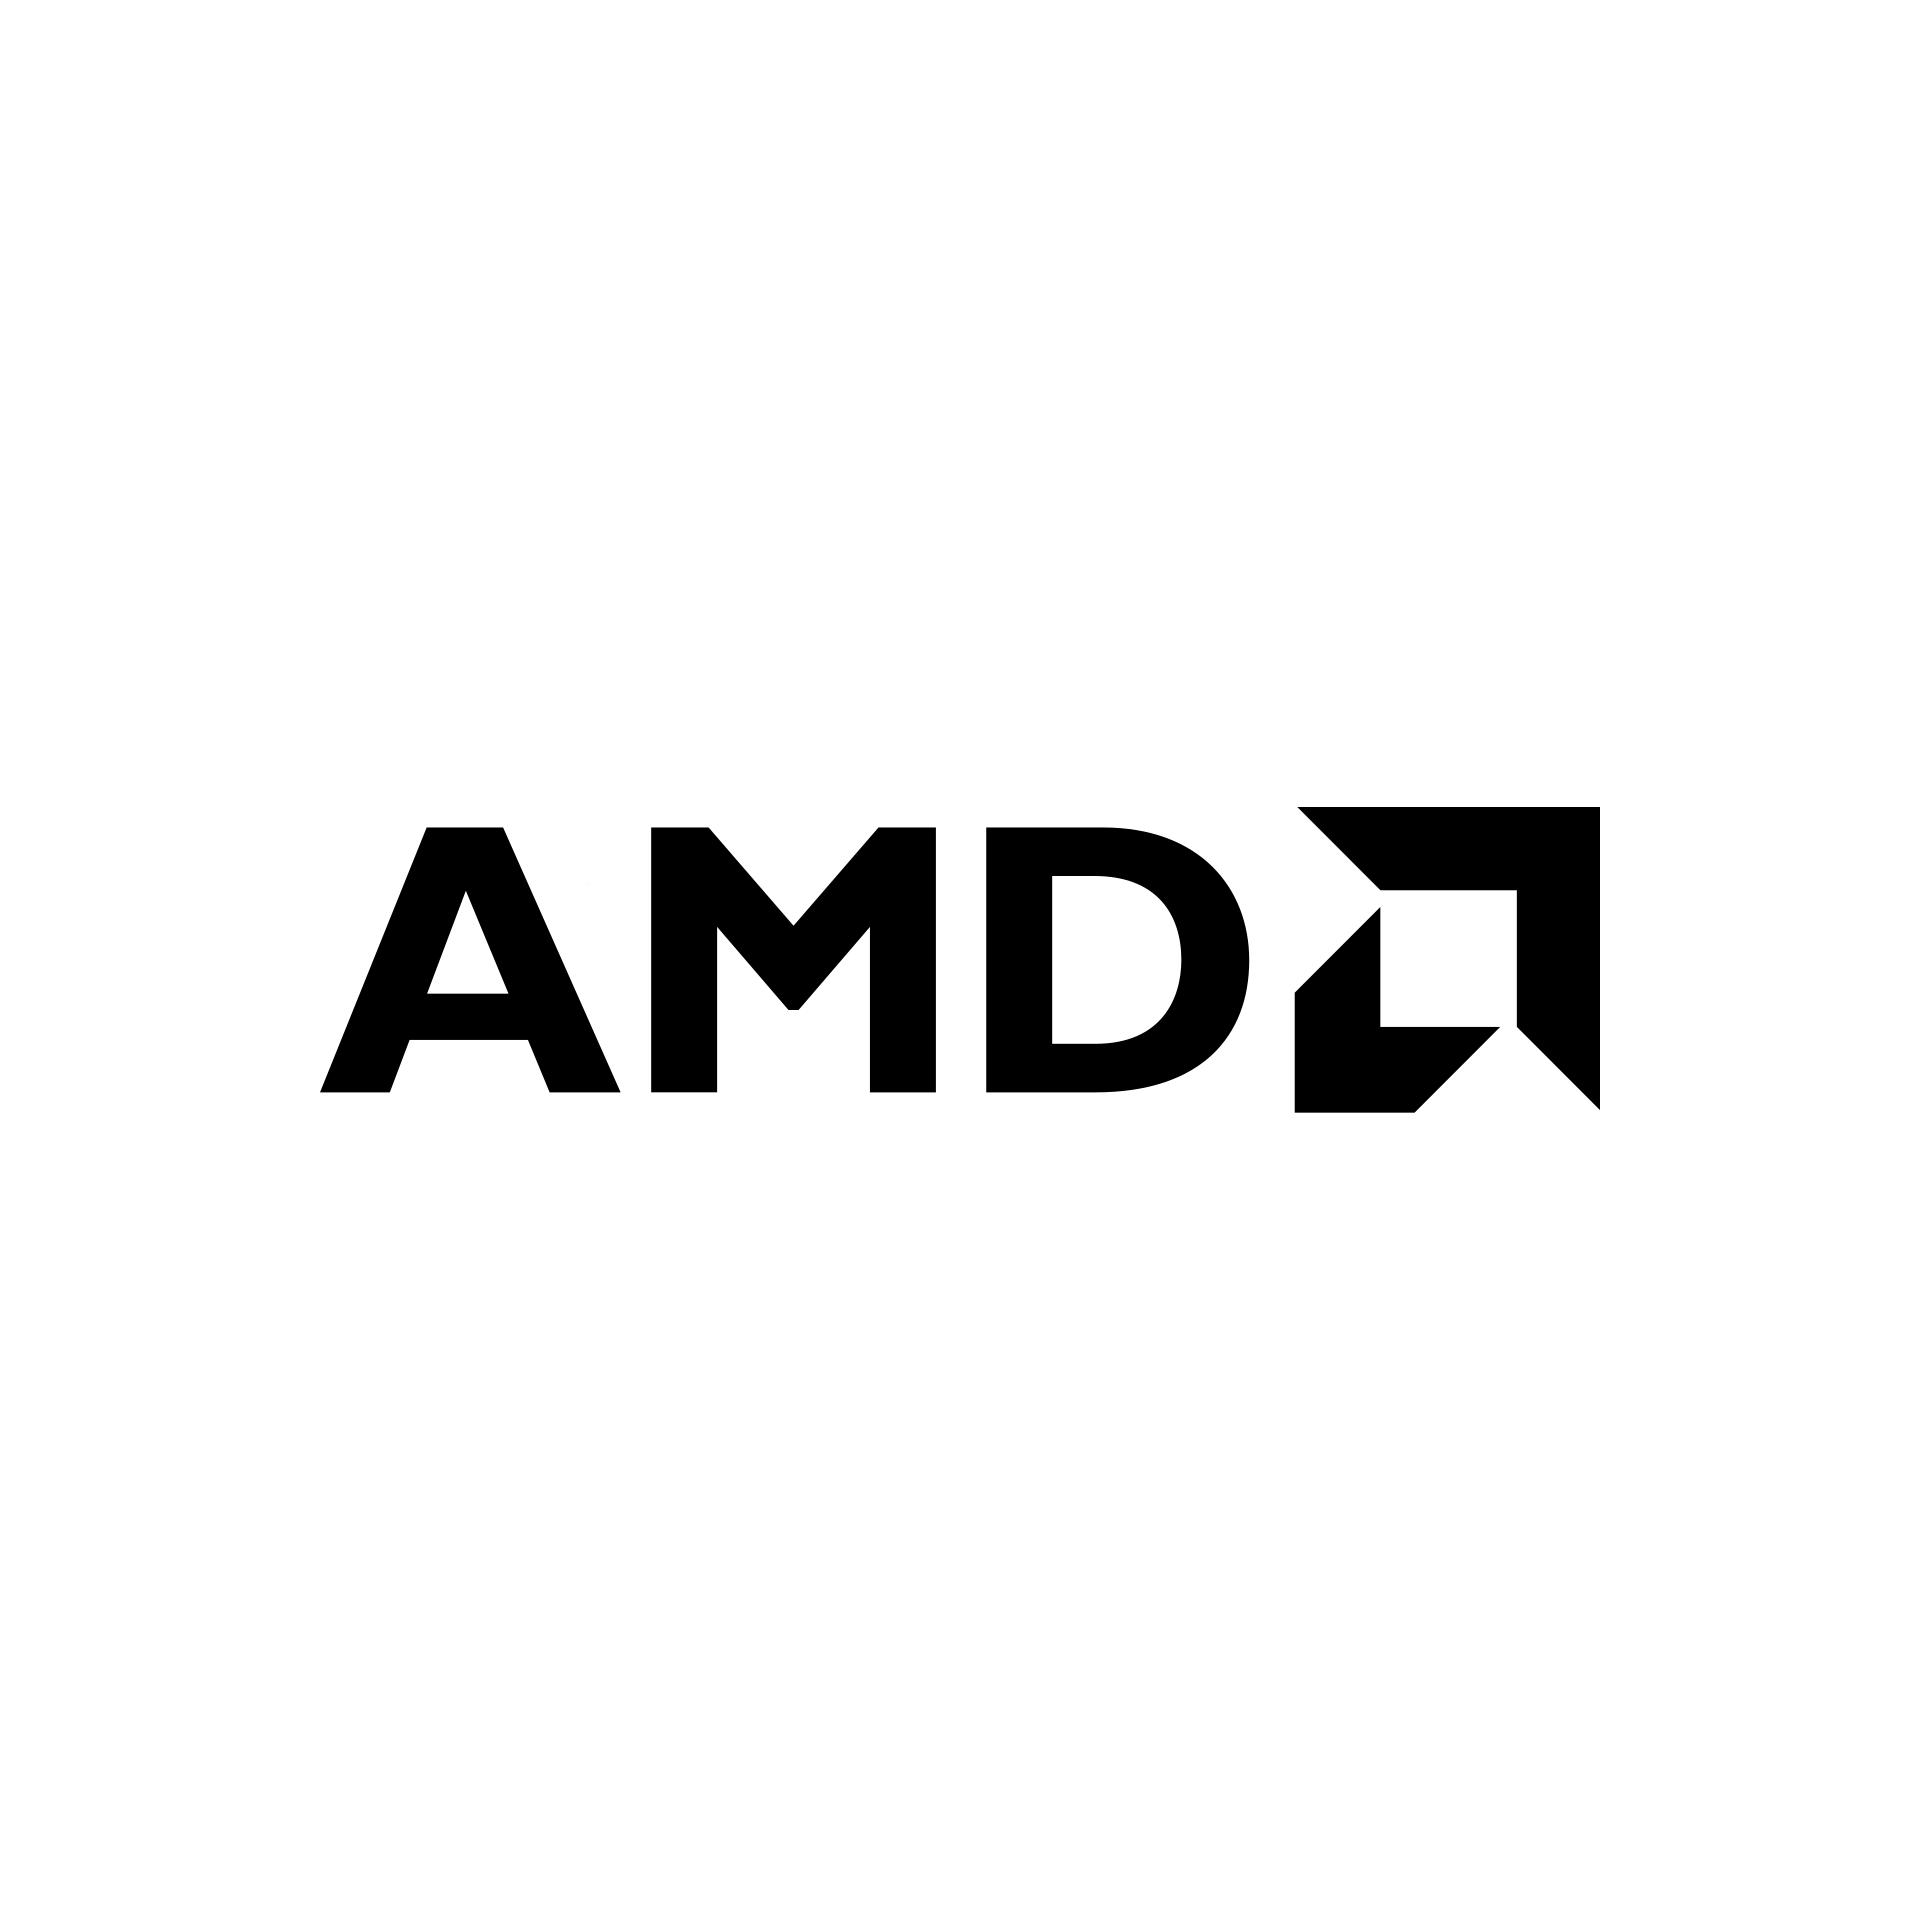 1280px-AMD_Loqgo.svg